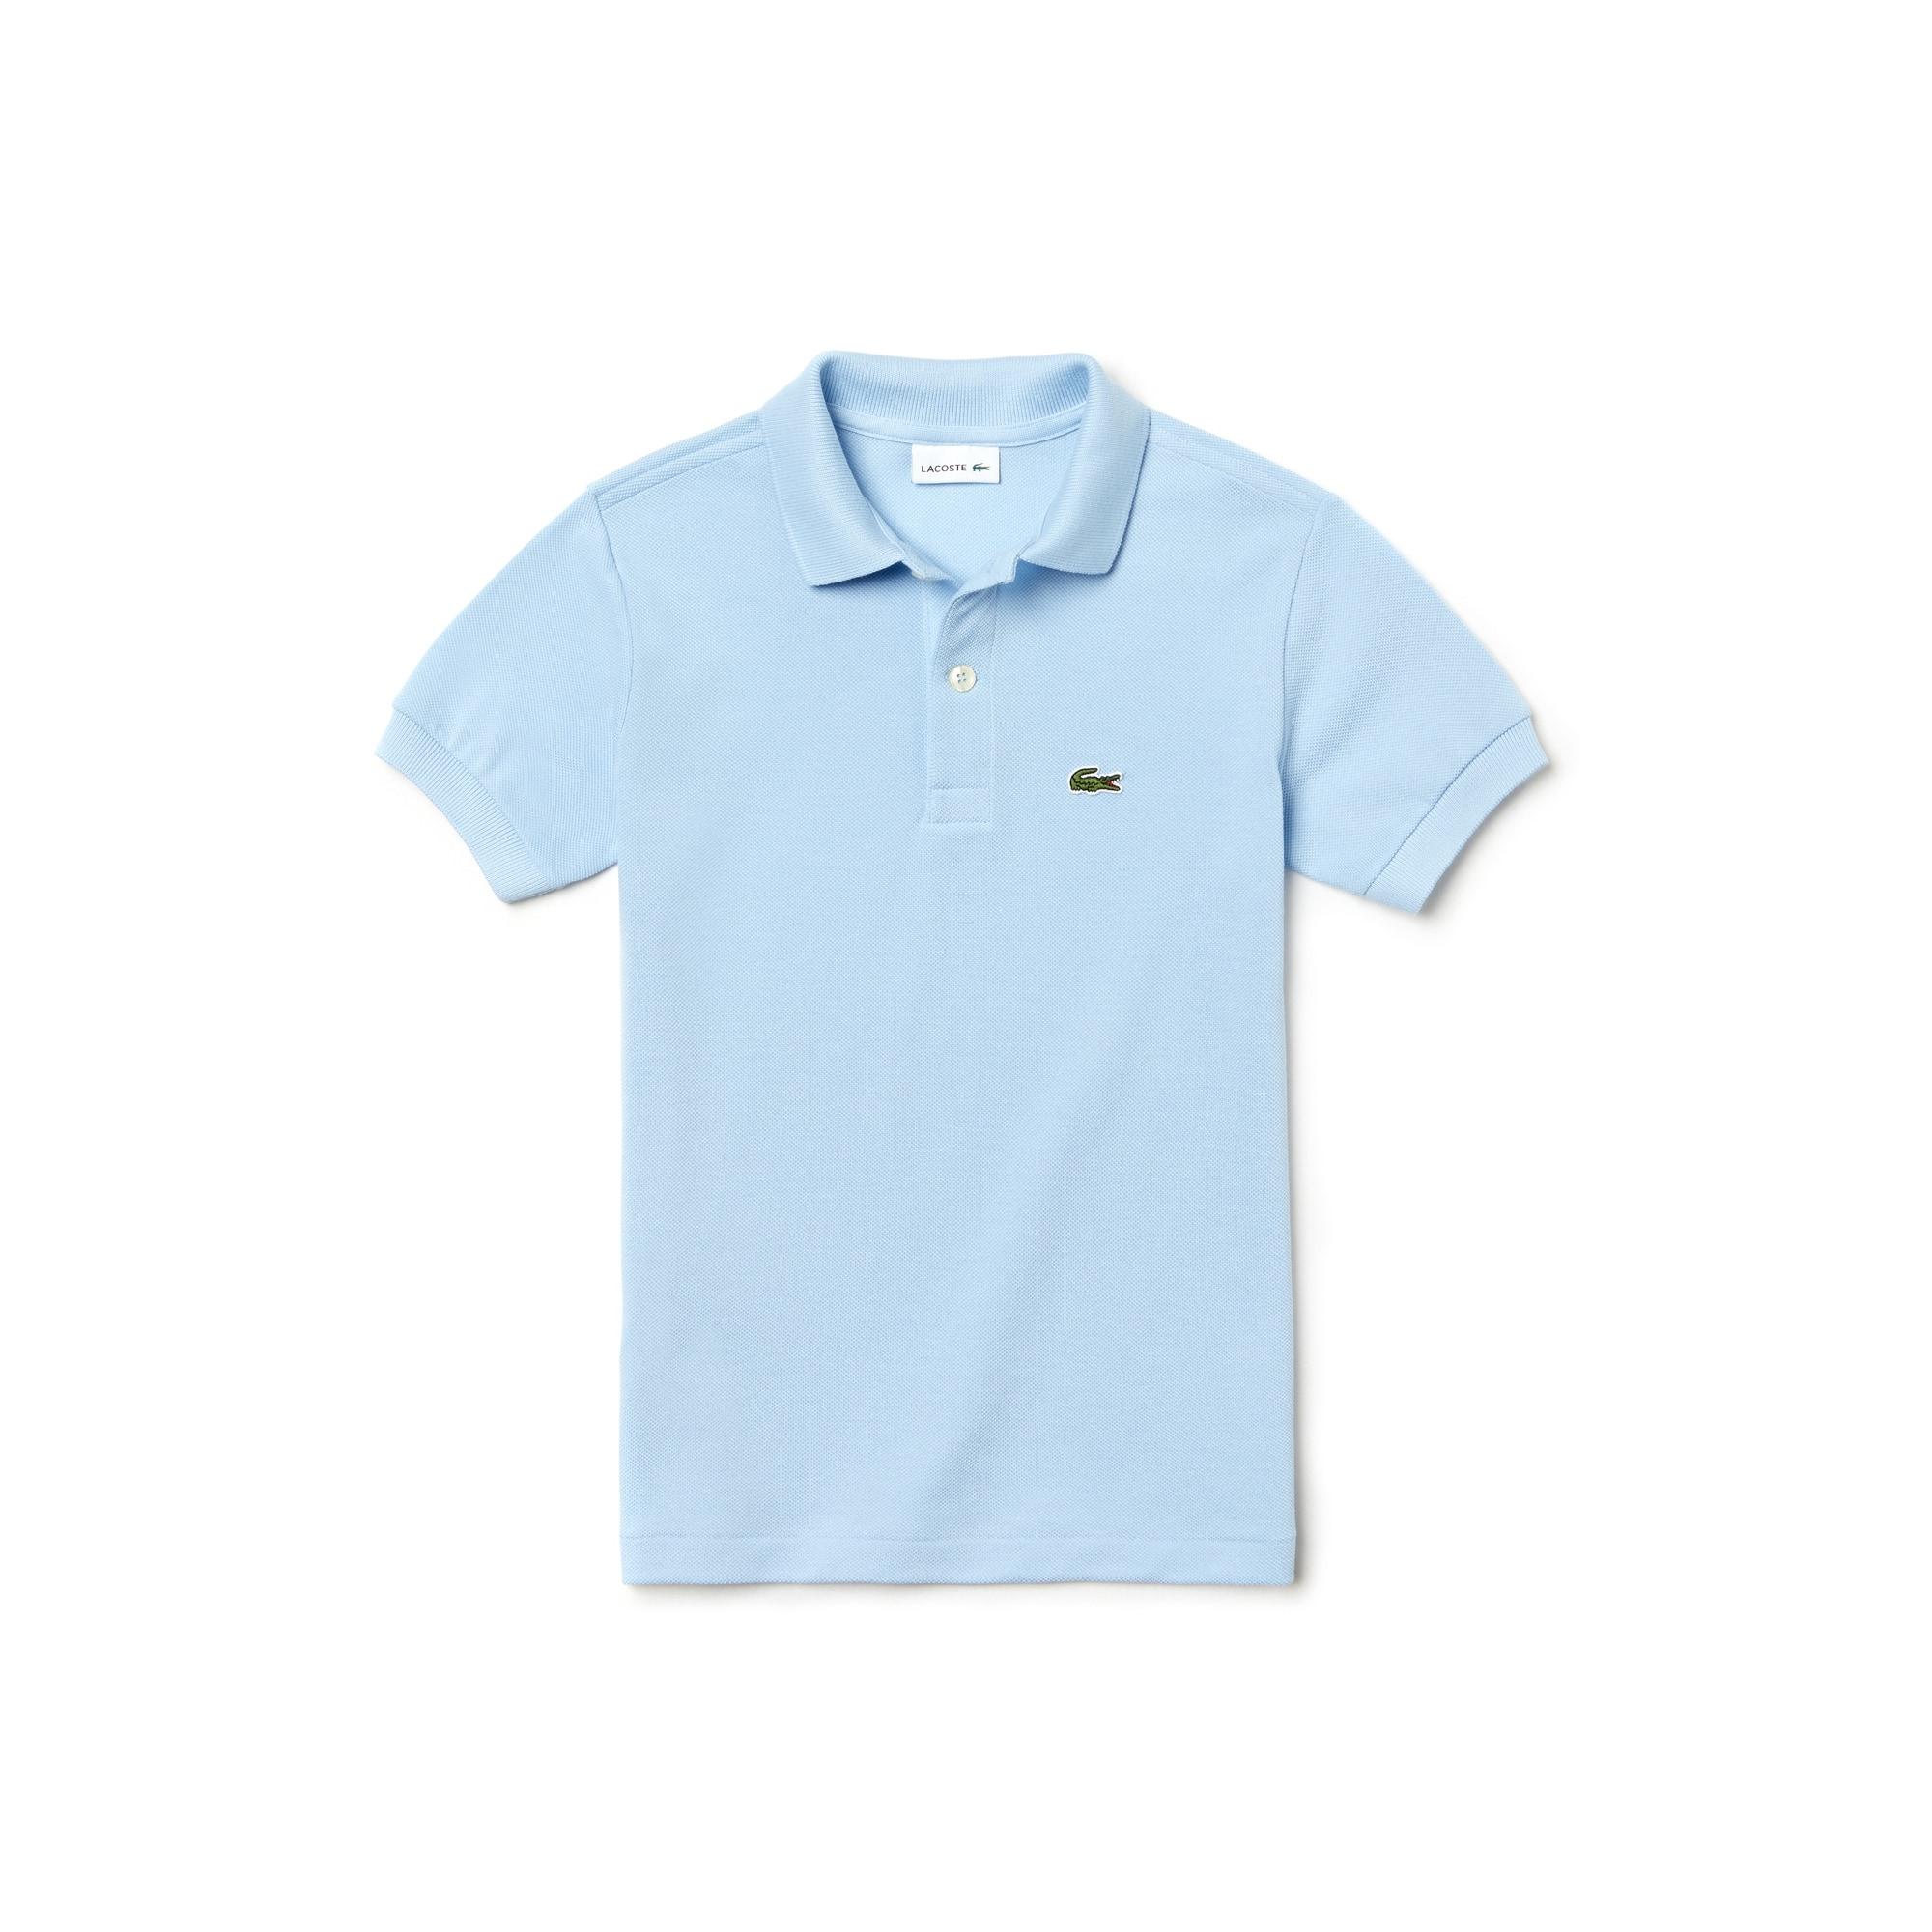 ef24f376 Boy's Polos | Kids Fashion | LACOSTE